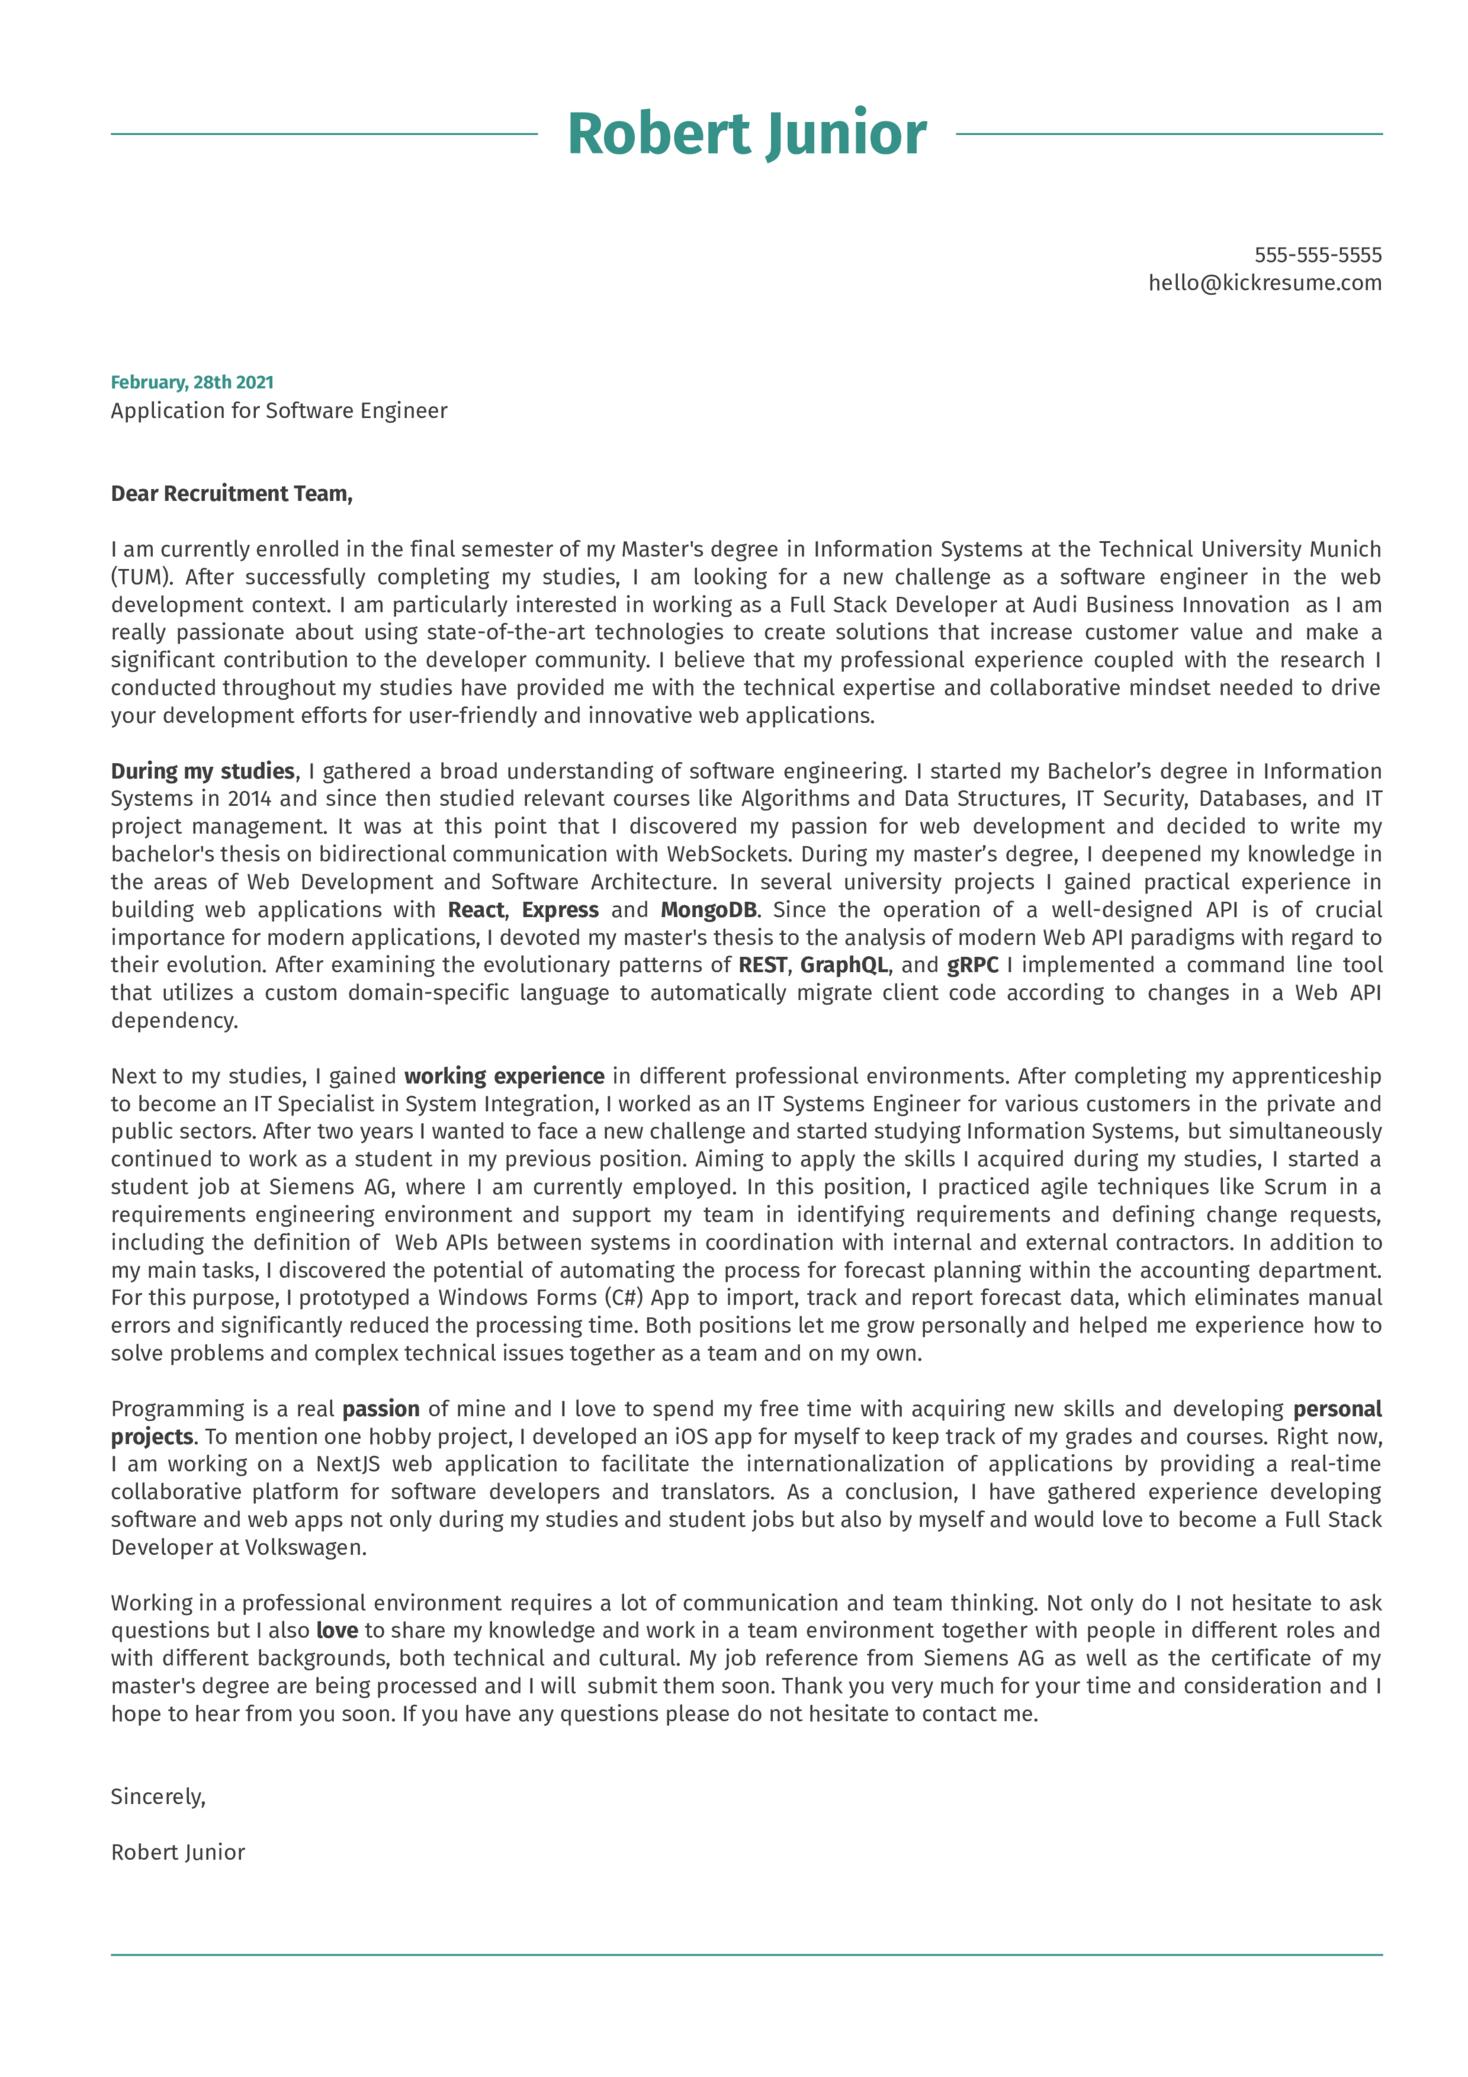 Software Engineer at Volkswagen Cover Letter Sample